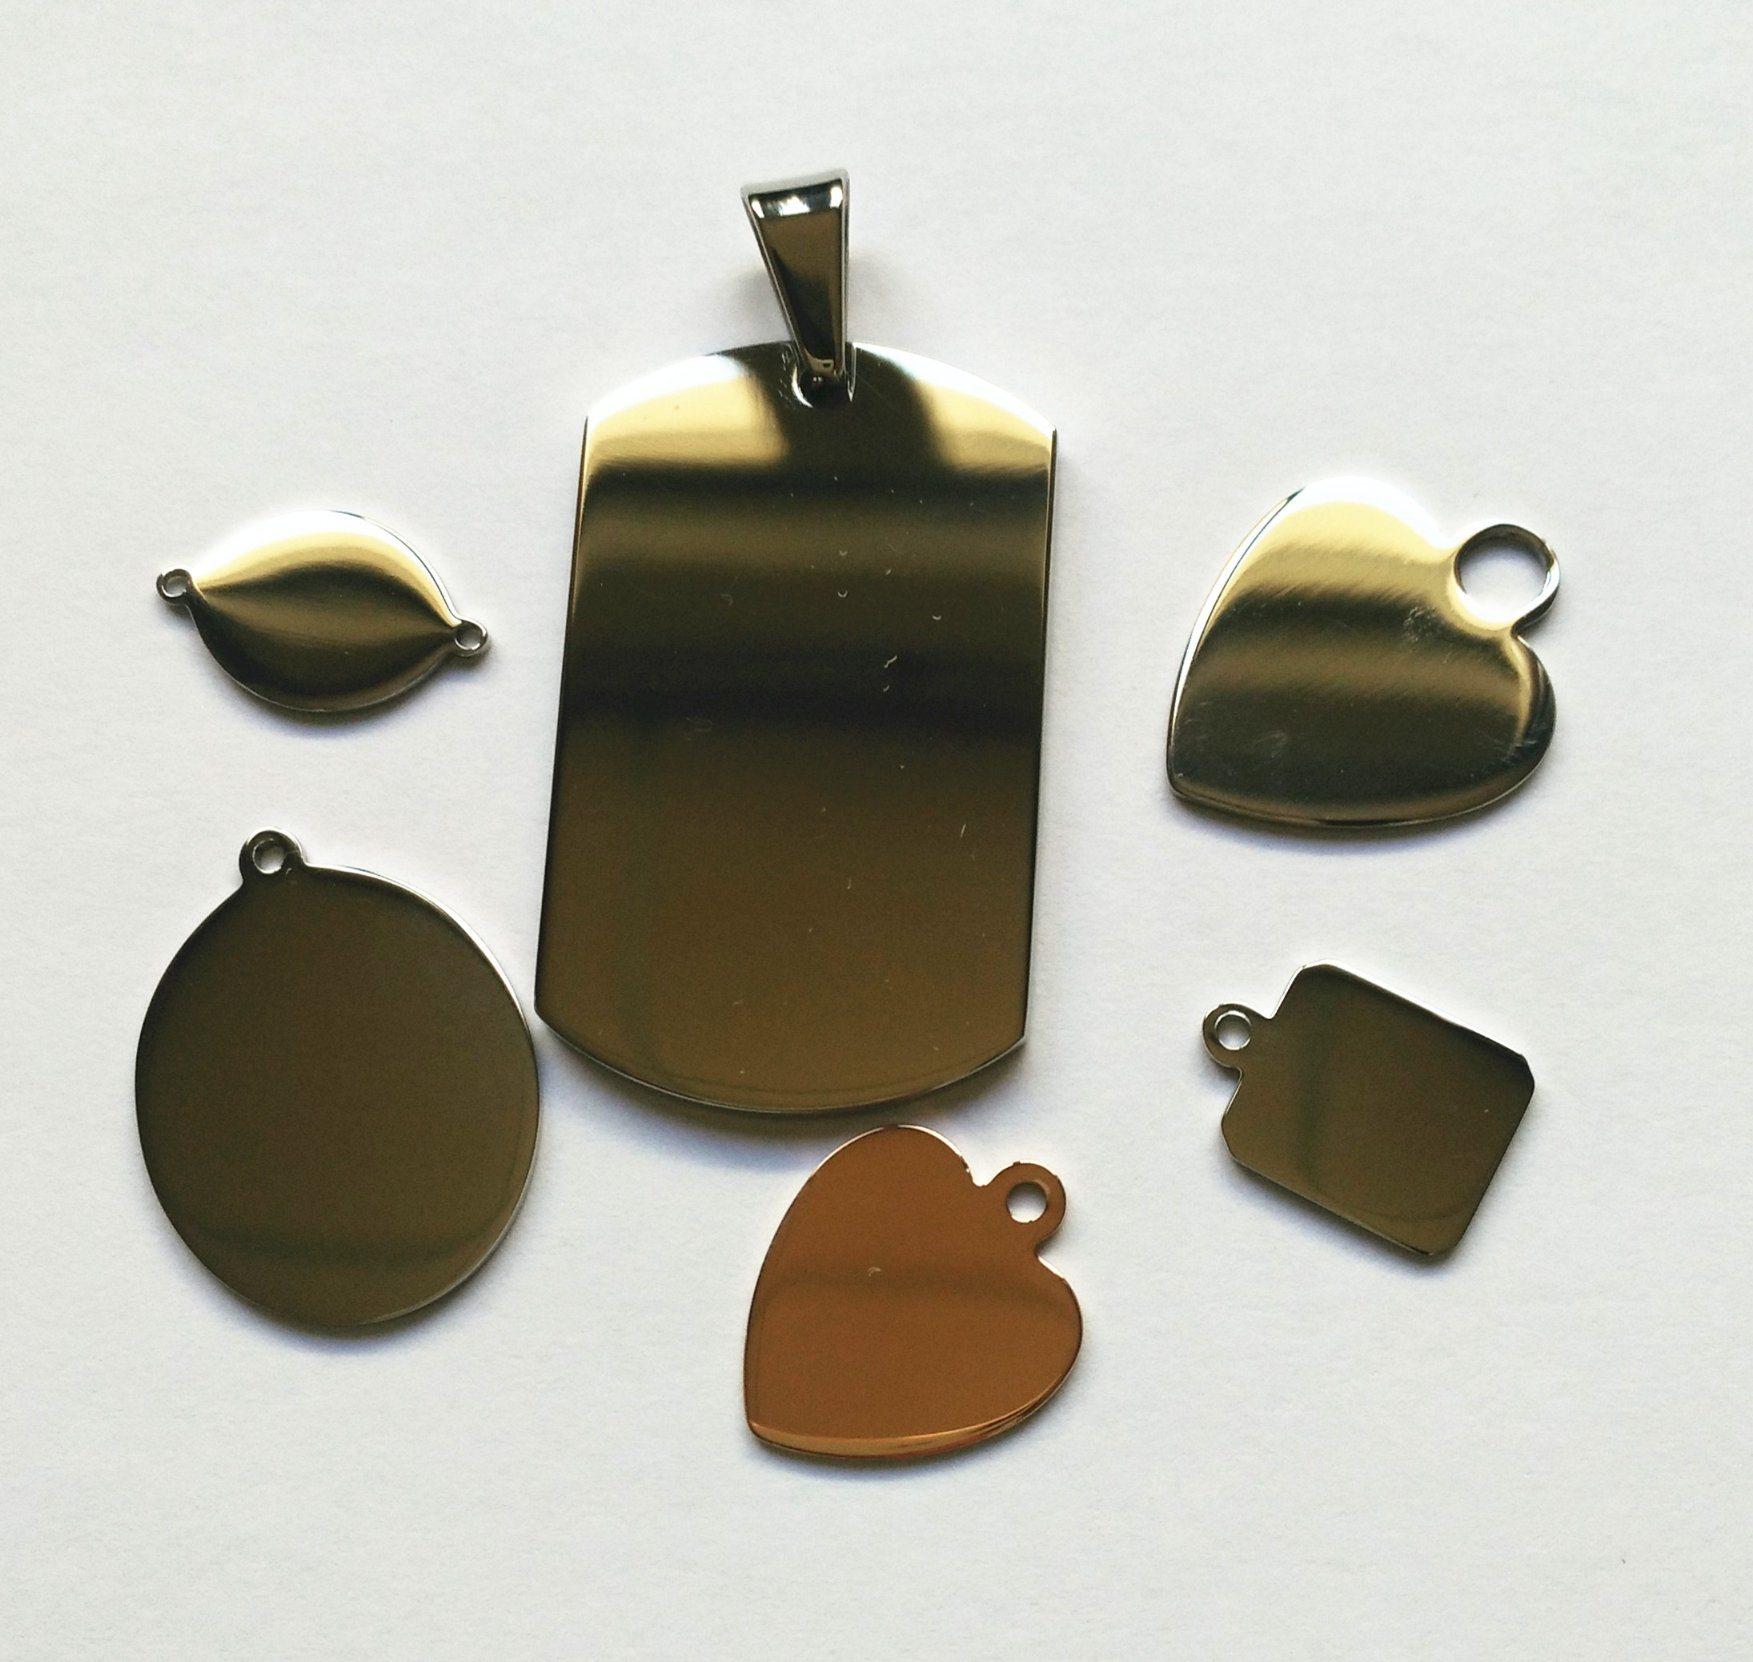 4023820dd353 China Any Shape Any Size Blank Dog Tag for Engraving - China Pendant ...